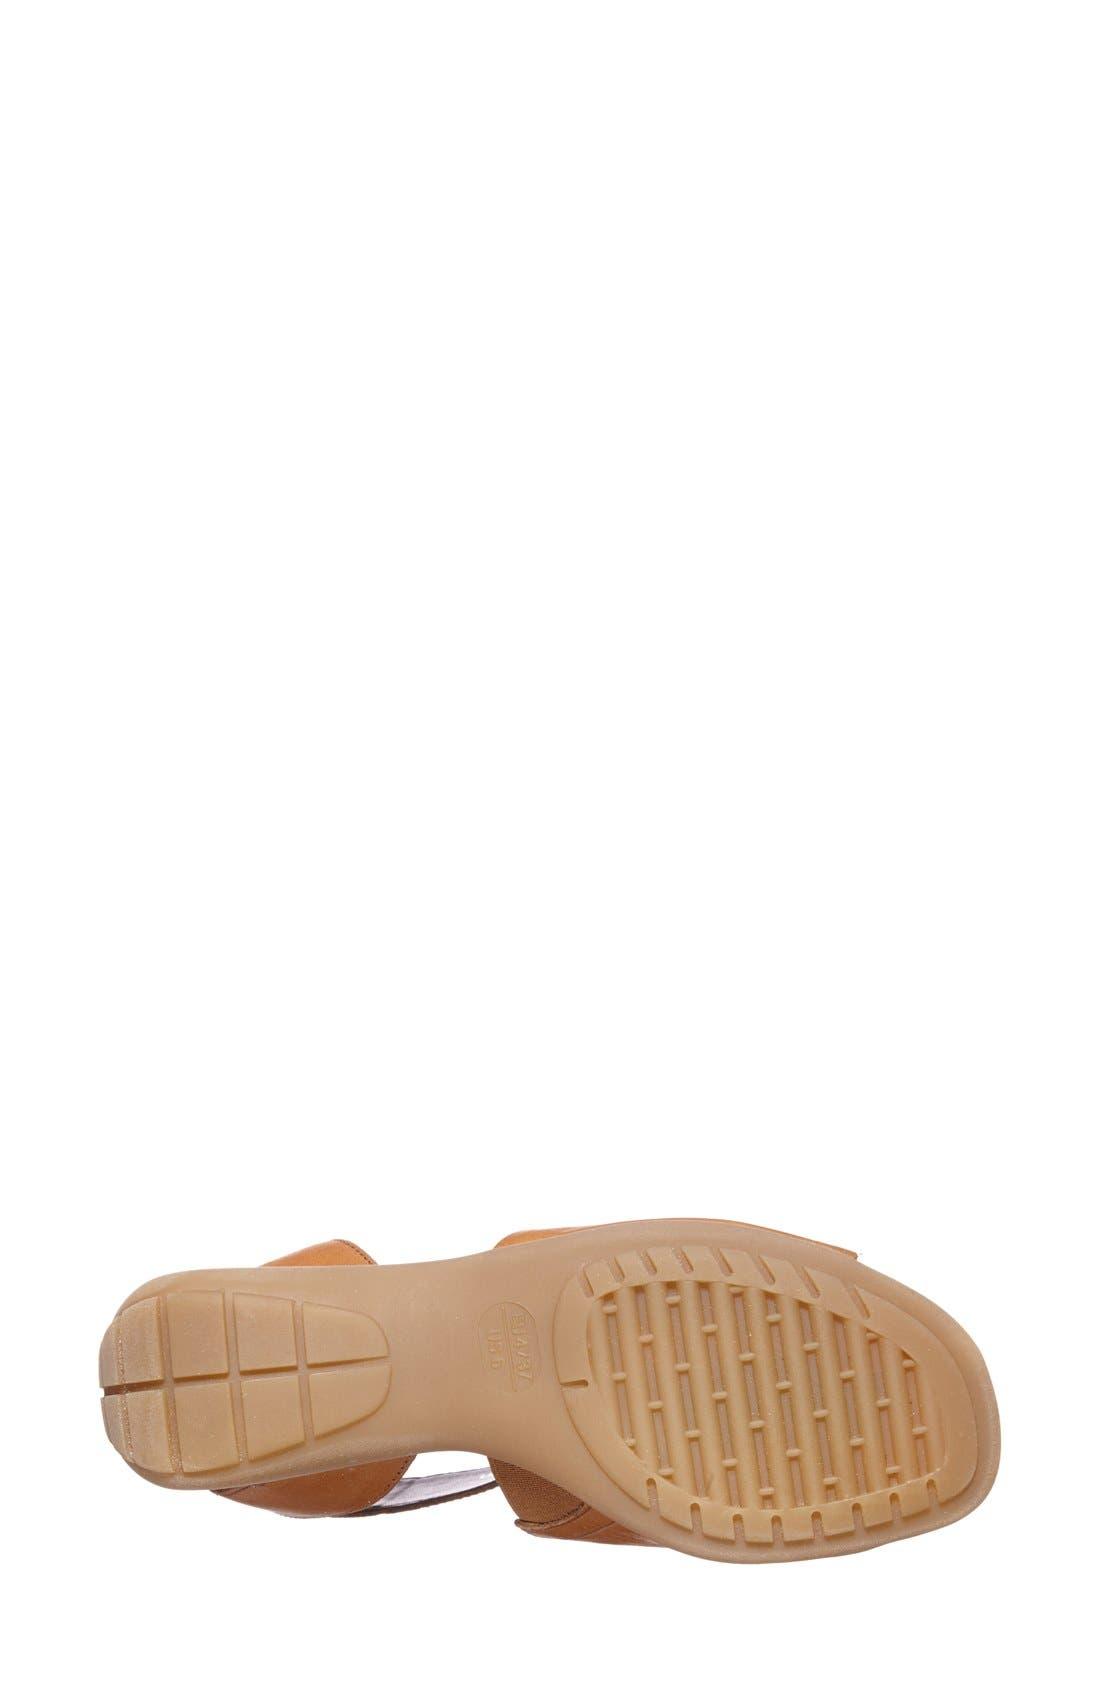 'Beglad' Leather Ankle Strap Sandal,                             Alternate thumbnail 59, color,